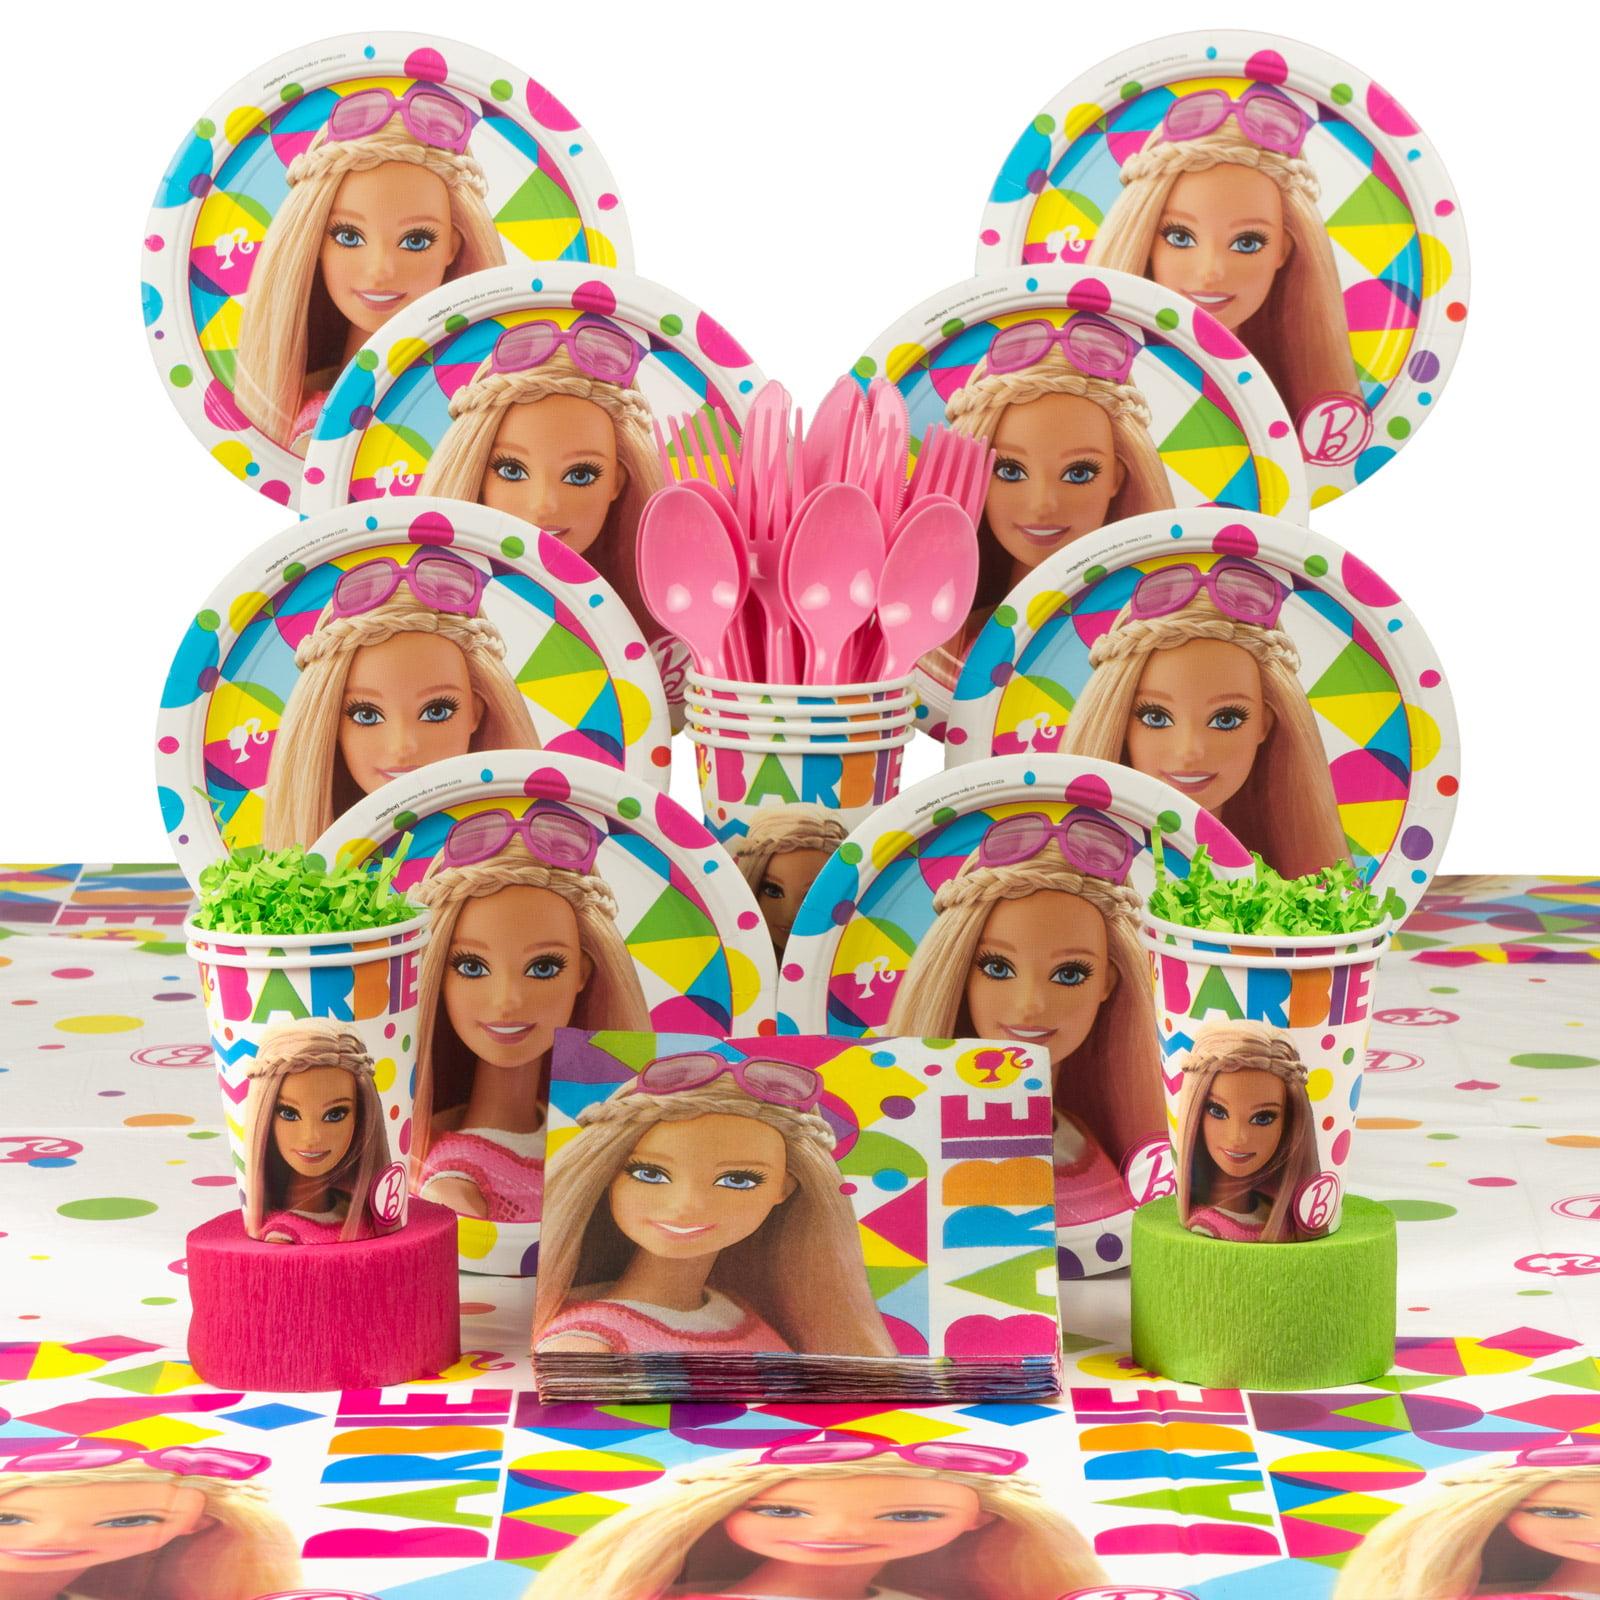 Barbie Sparkle Birthday Party Deluxe Tableware Kit (serves 8)